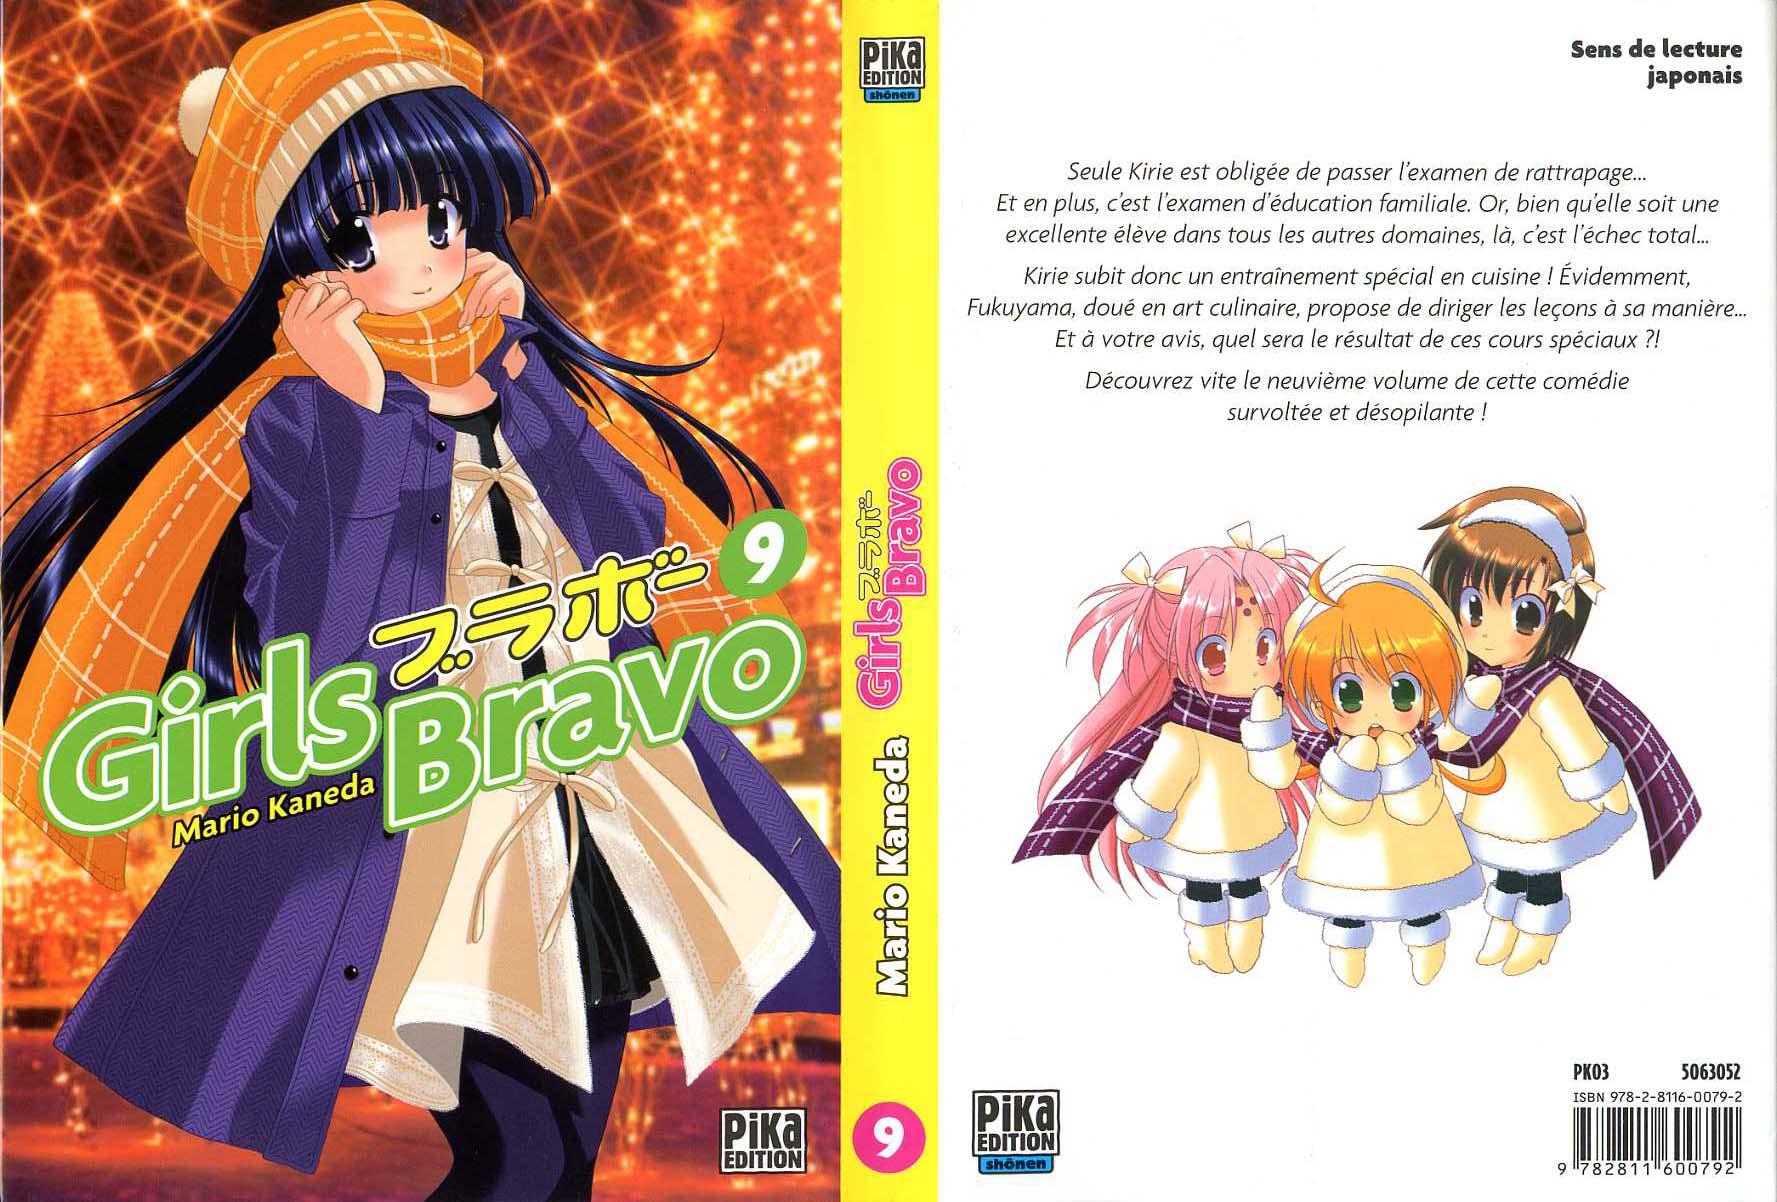 https://nine.mangadogs.com/fr_manga/pic1/31/1951/73615/GirlsBravoVolume9VF_0_873.jpg Page 1